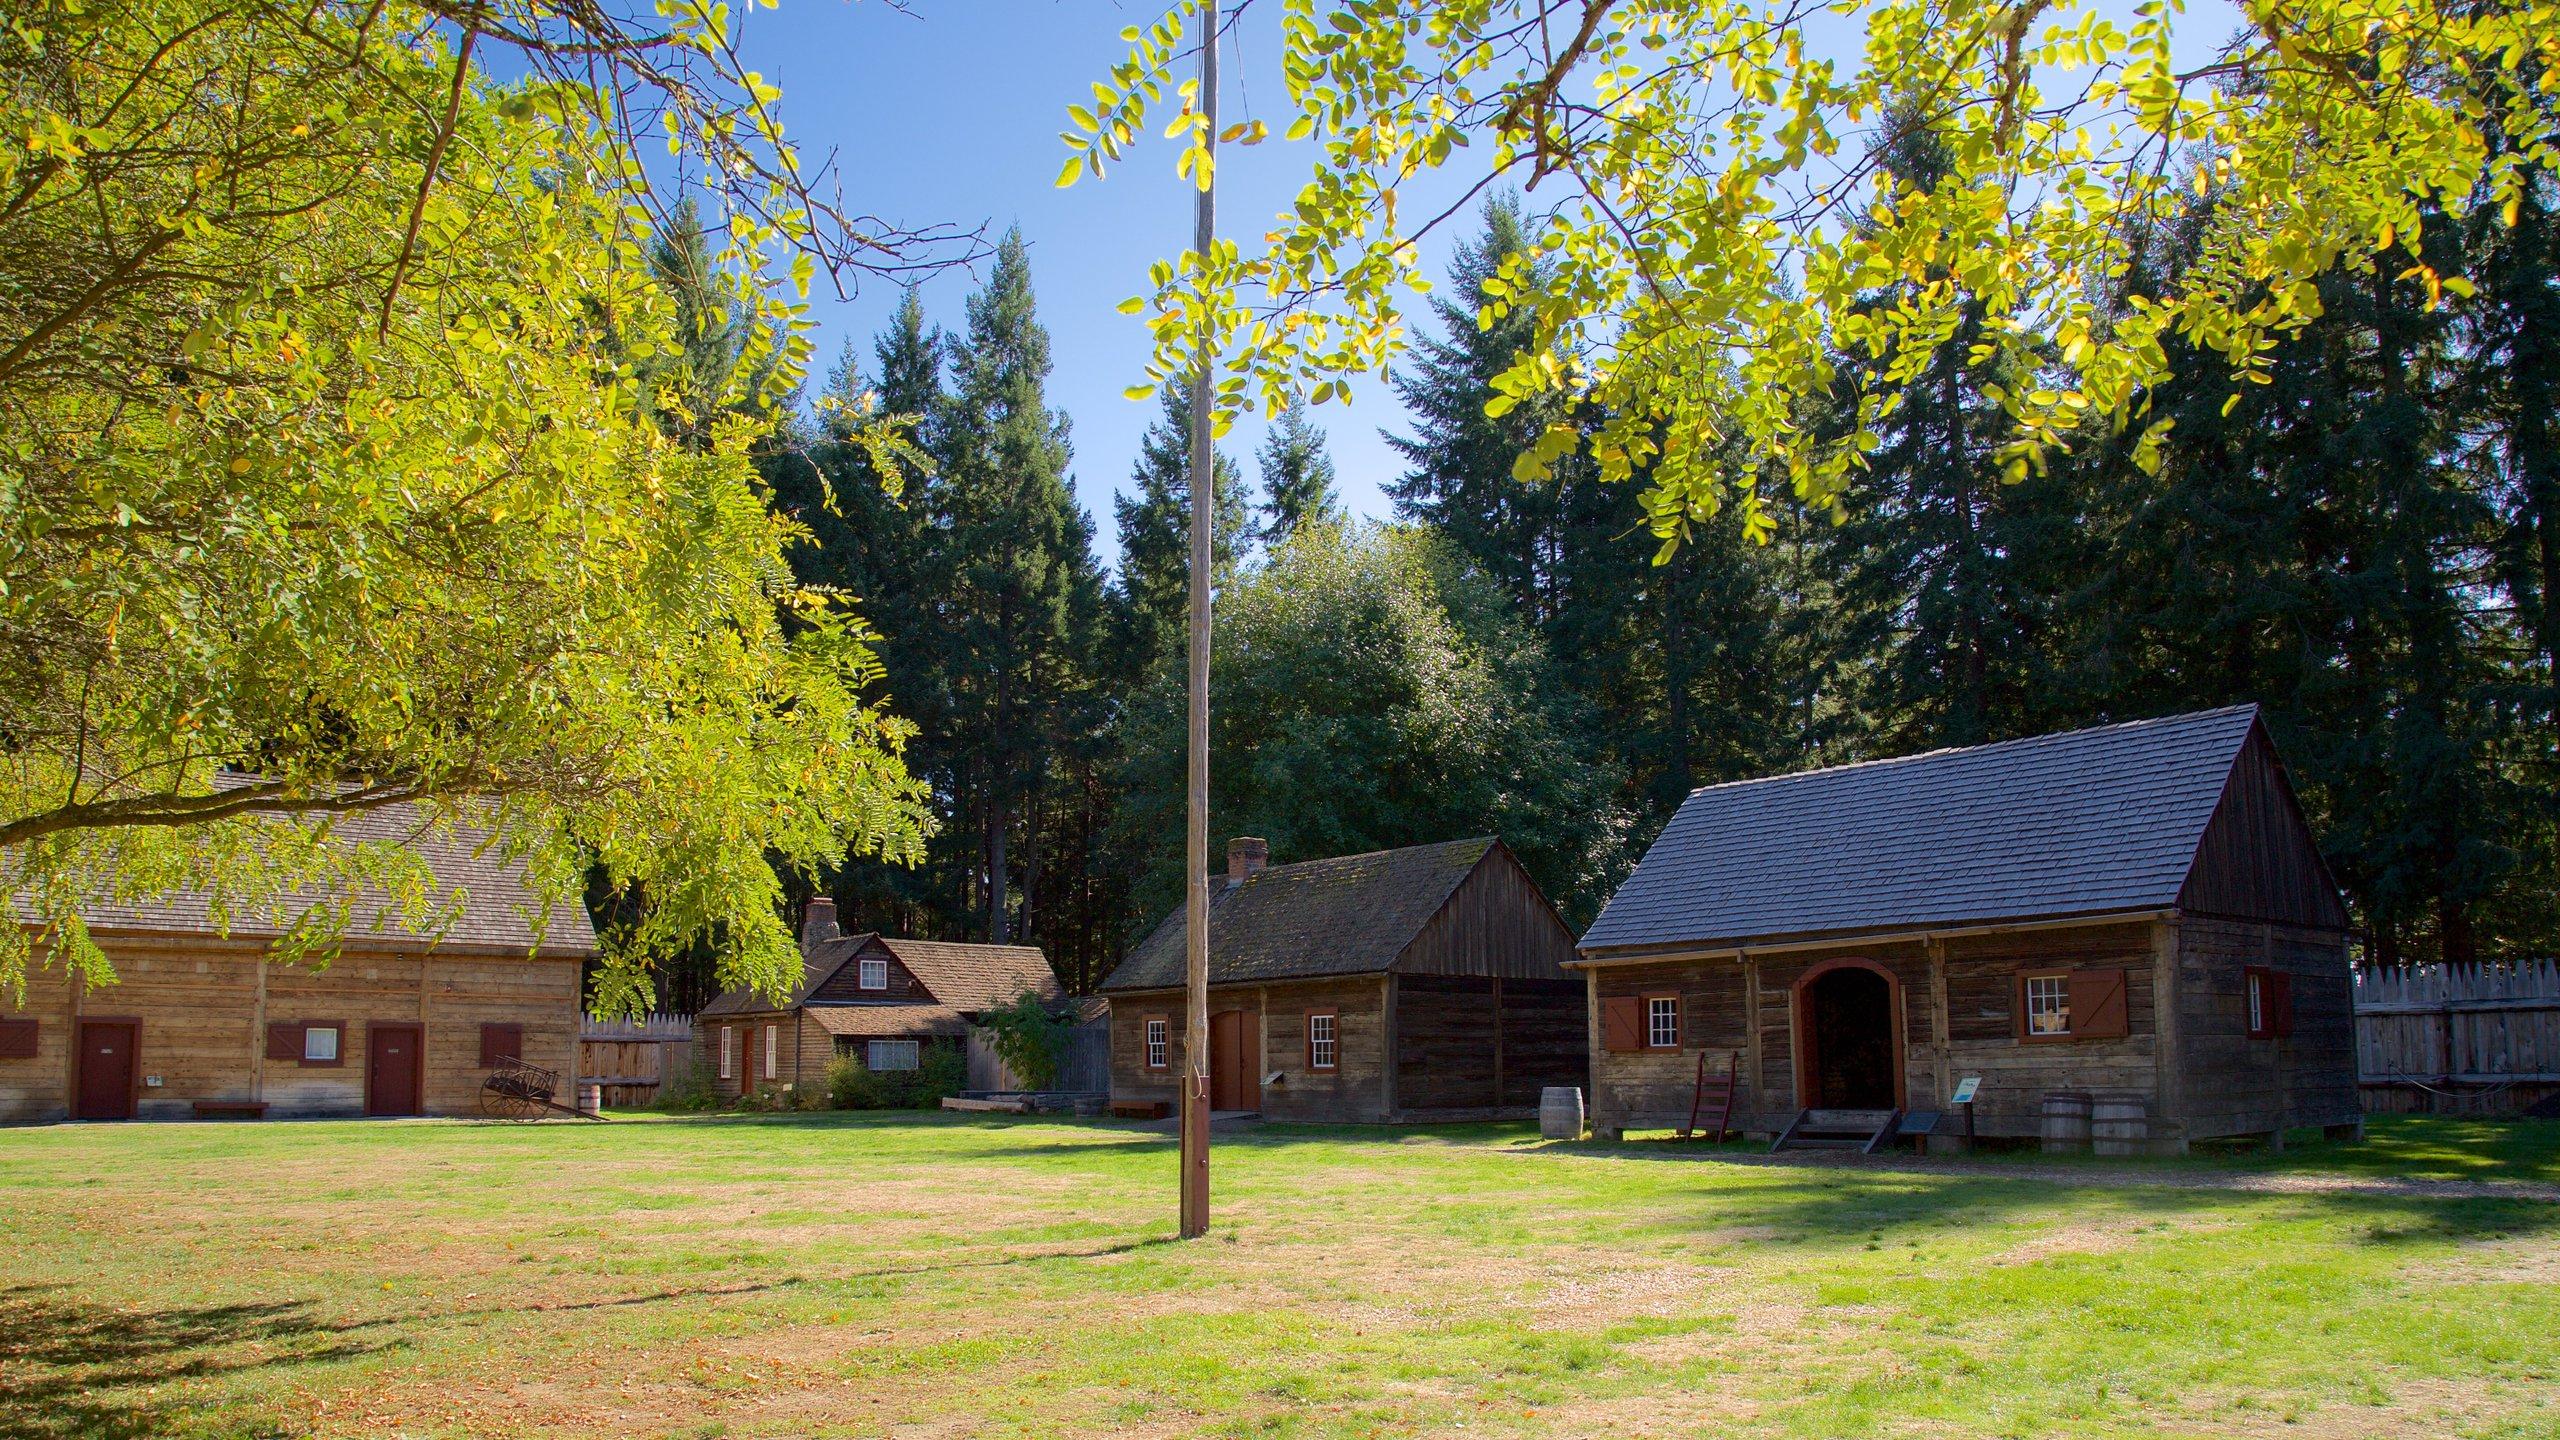 Fort Nisqually Living History Museum, Tacoma, Washington, United States of America